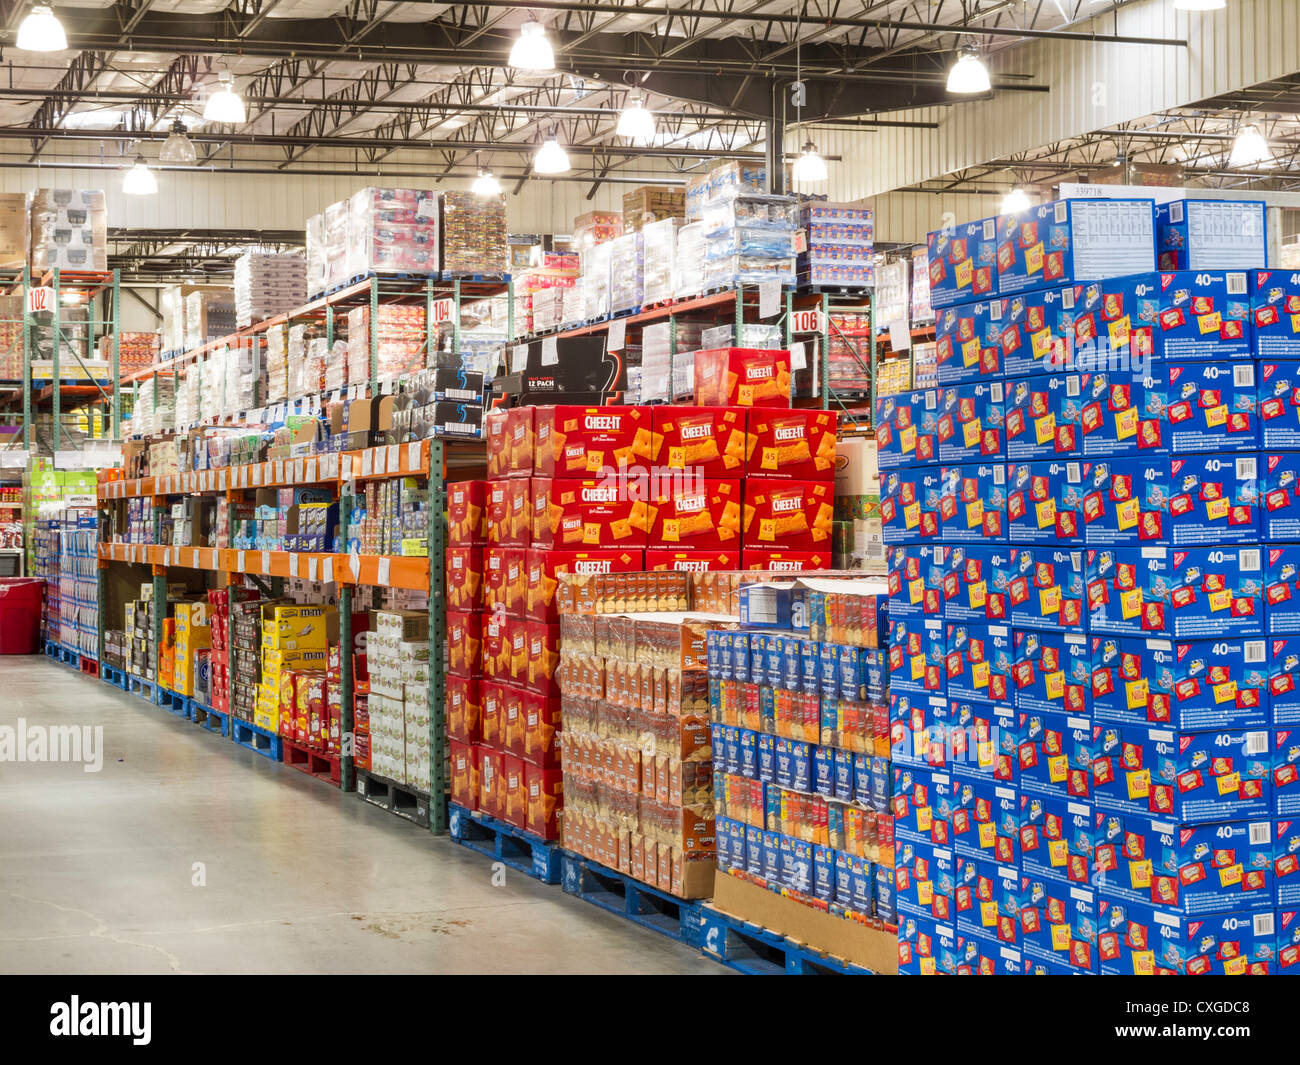 Costco Wholesale Warehouse Store Stock Photo: 50763560 - Alamy  Costco Wholesal...